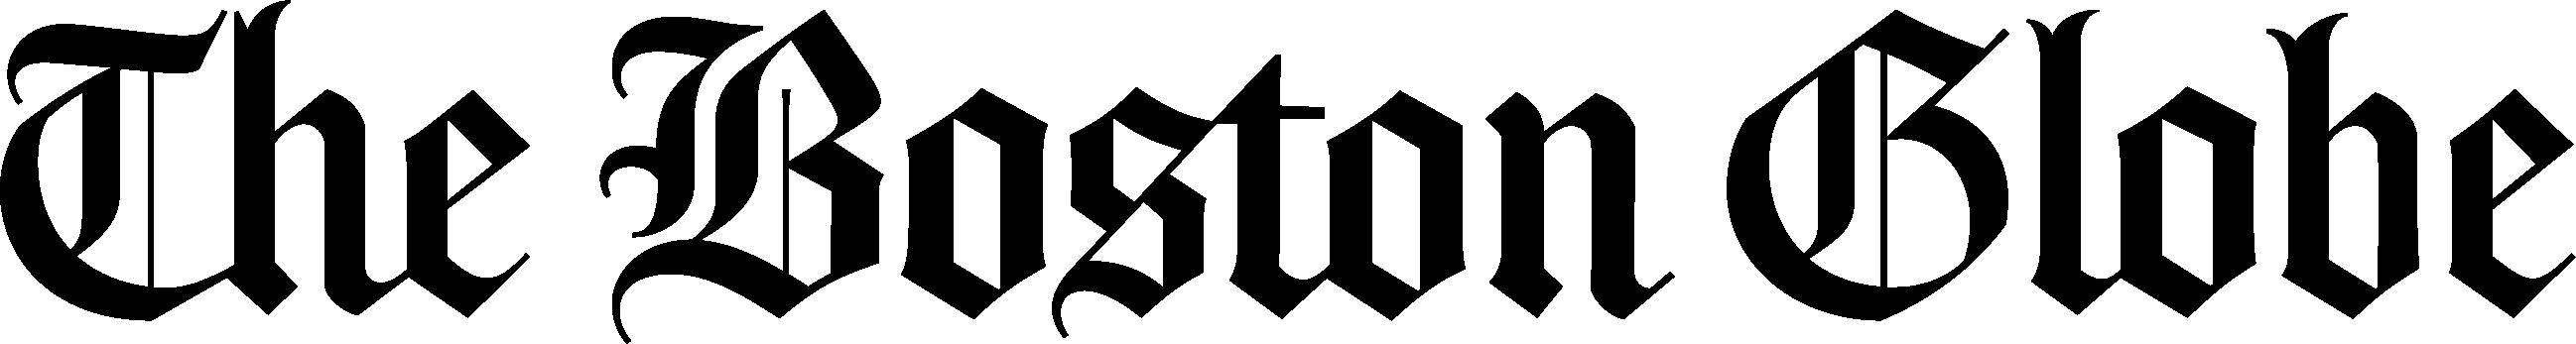 Image result for boston globe logo